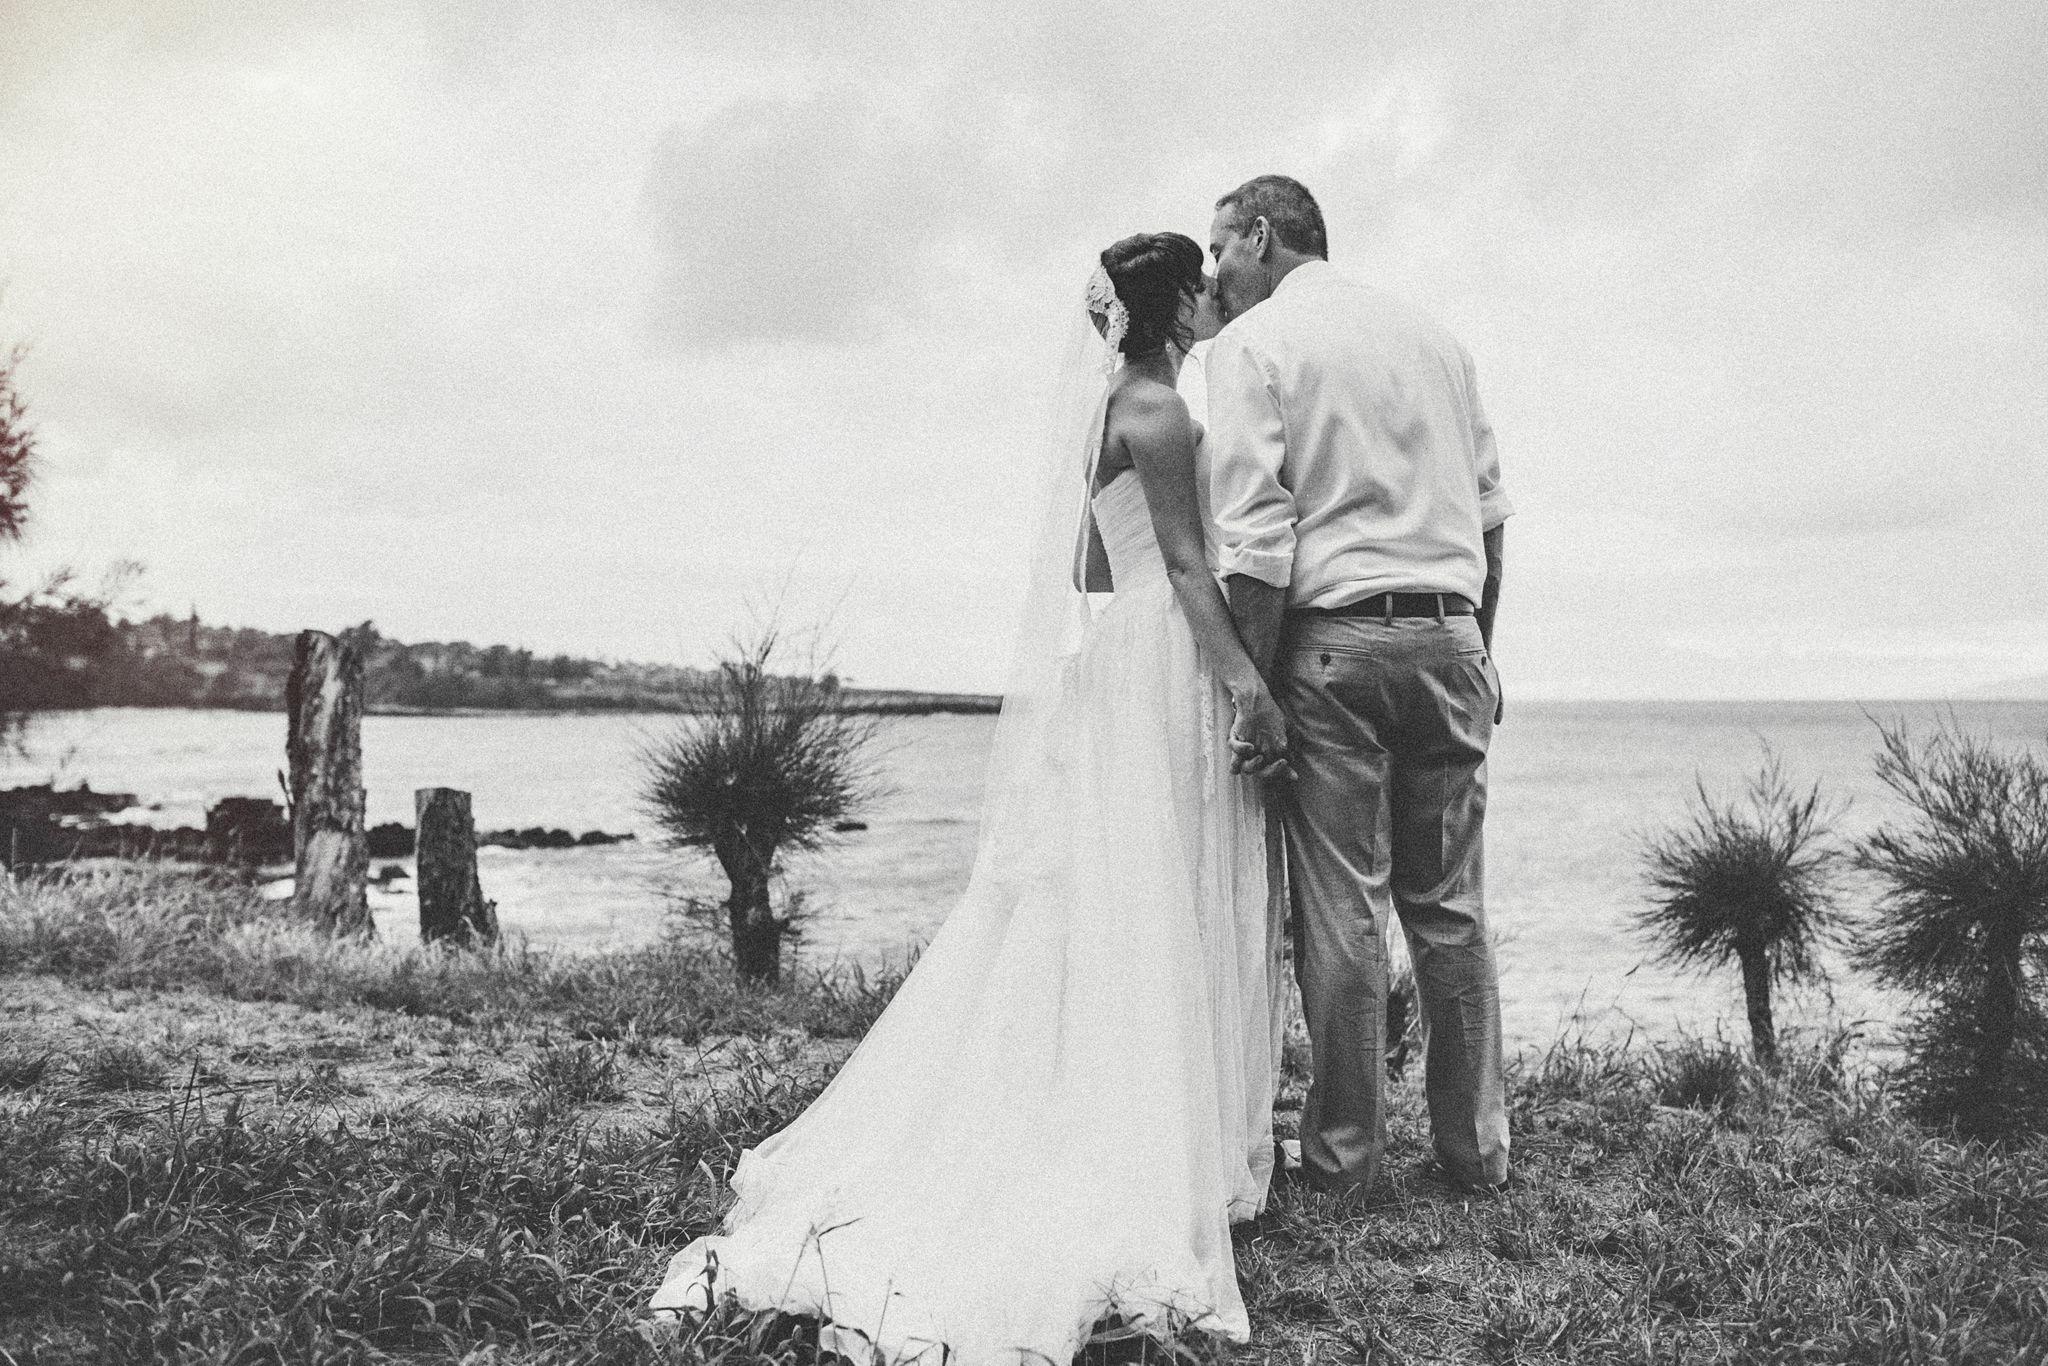 Oceanside Elegance at Kaimana Estate, Maui, Hawaii | Wedding Photographer | Photographer: http://www.caitlincatheyphoto.com/